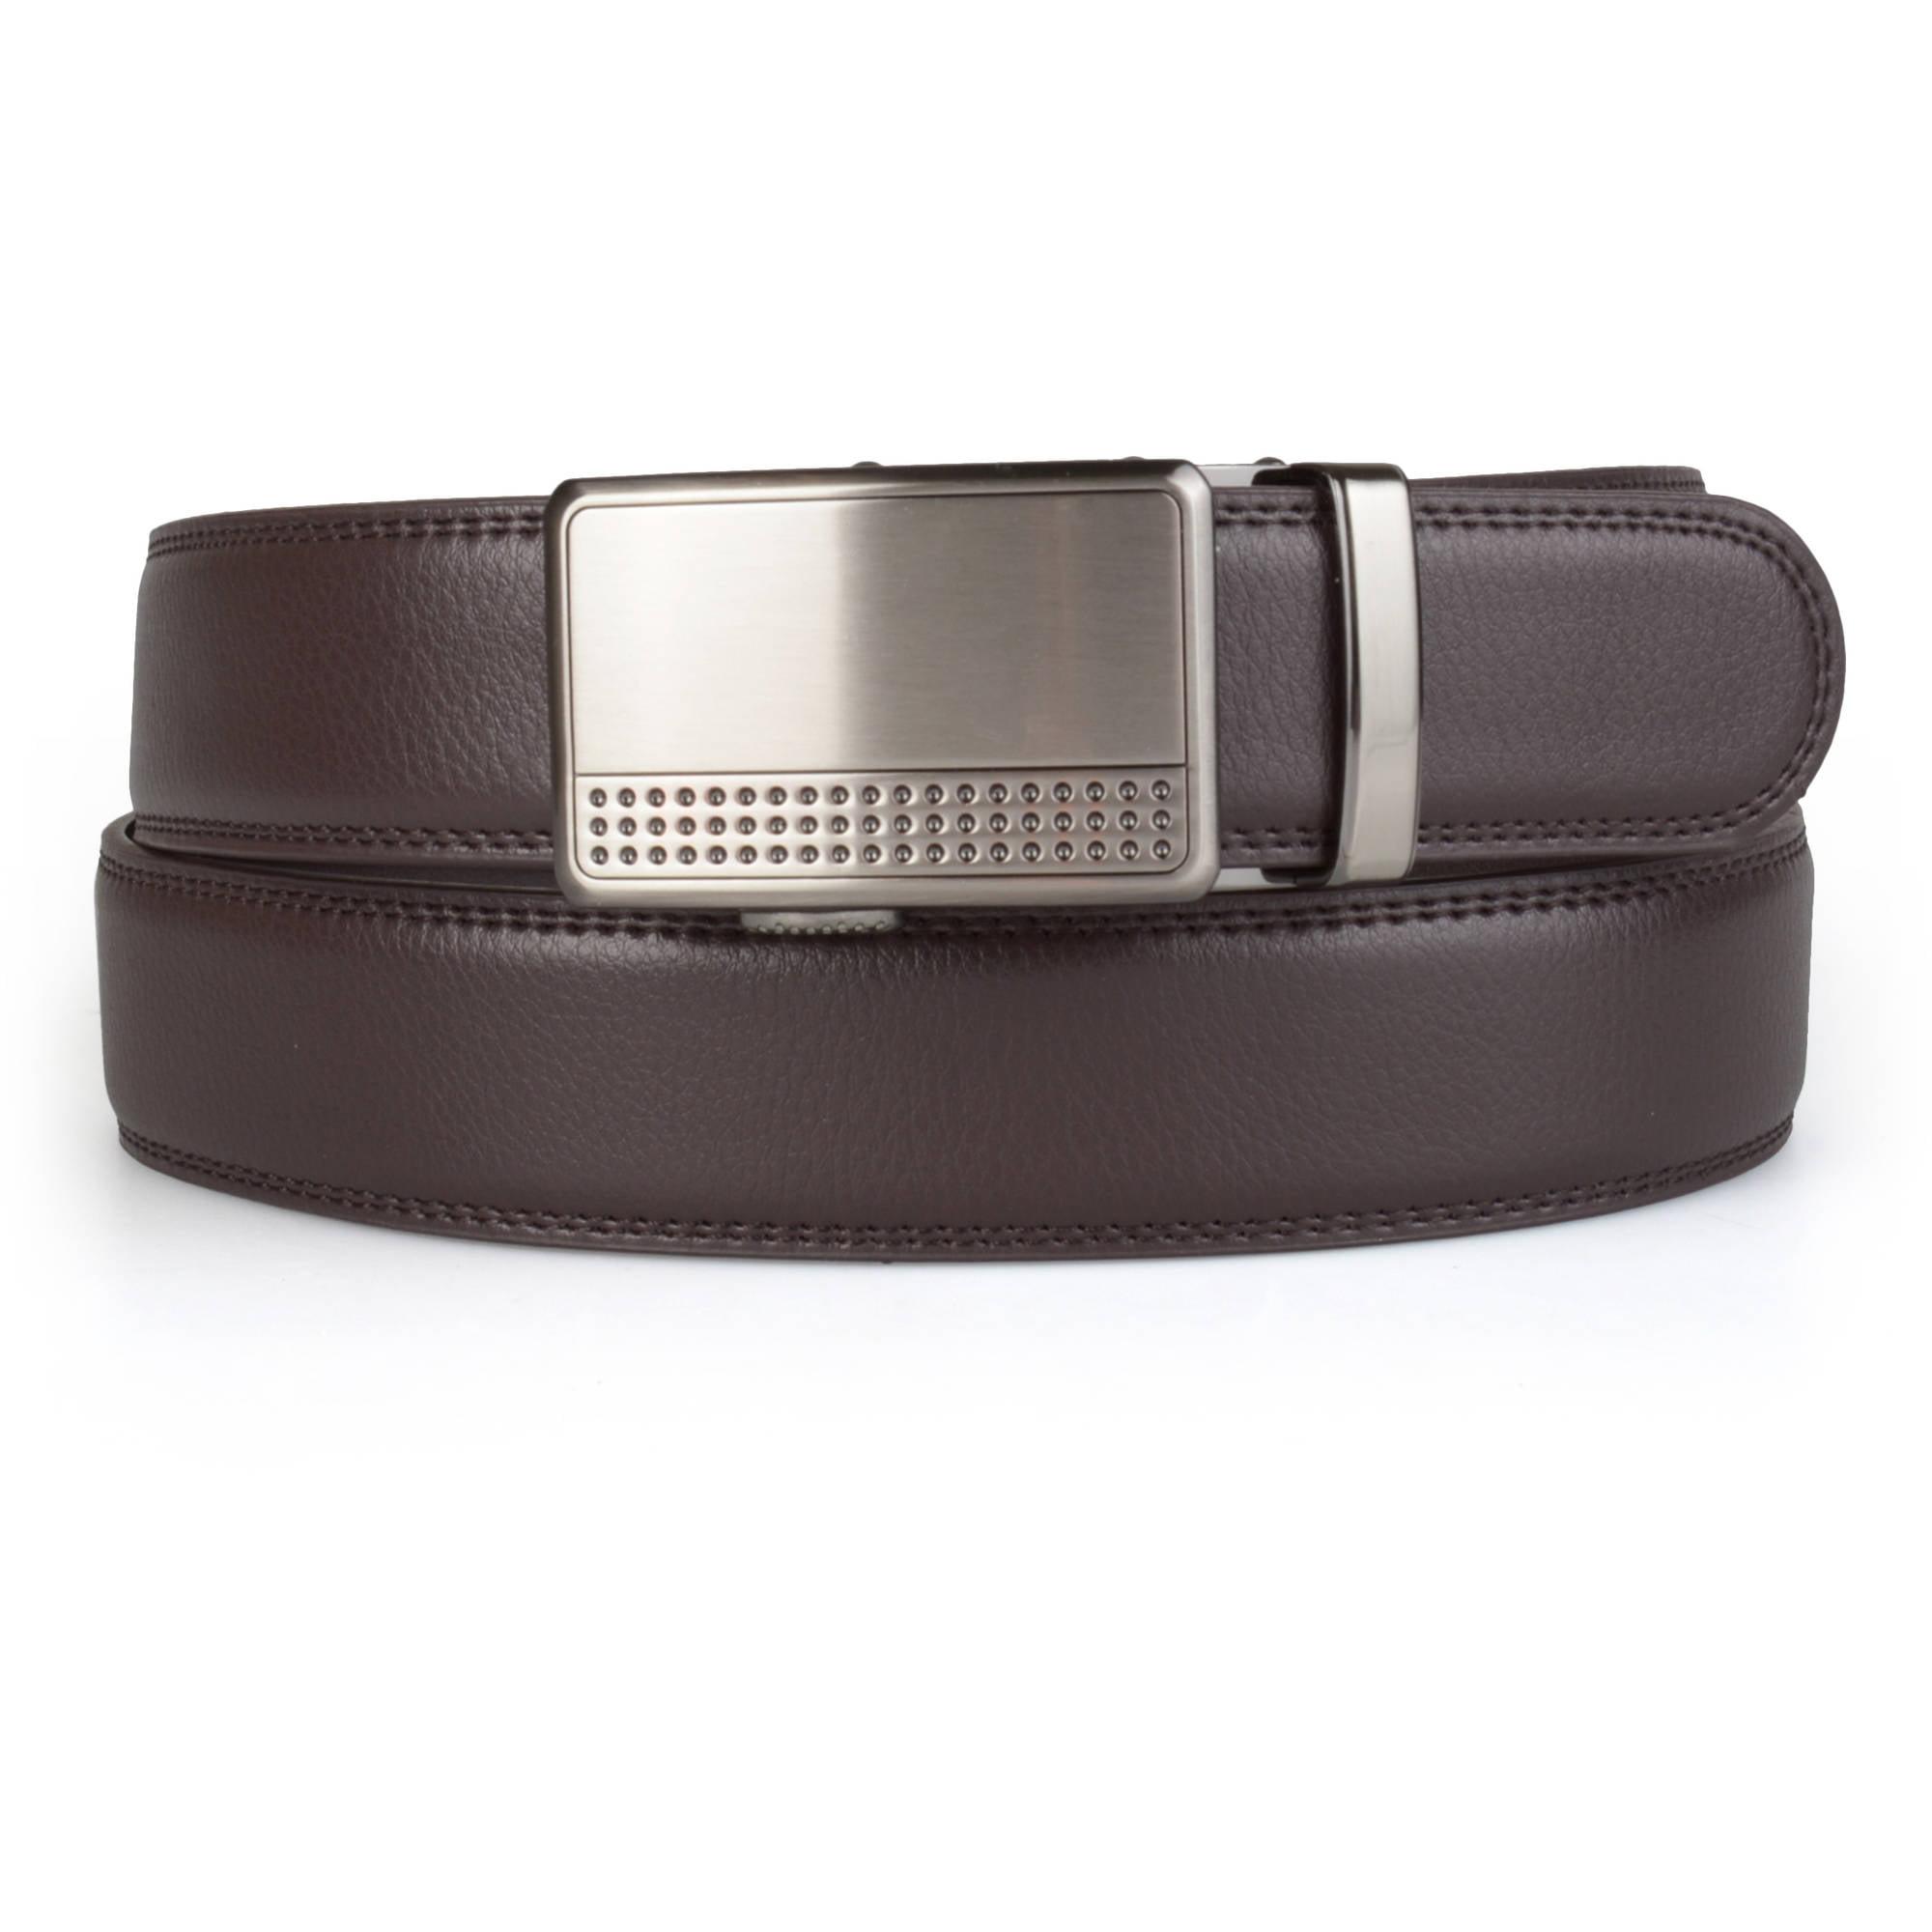 New Men Fashion PU Leather Auto Lock Comfort Click Belt W//Steel Buckle ok